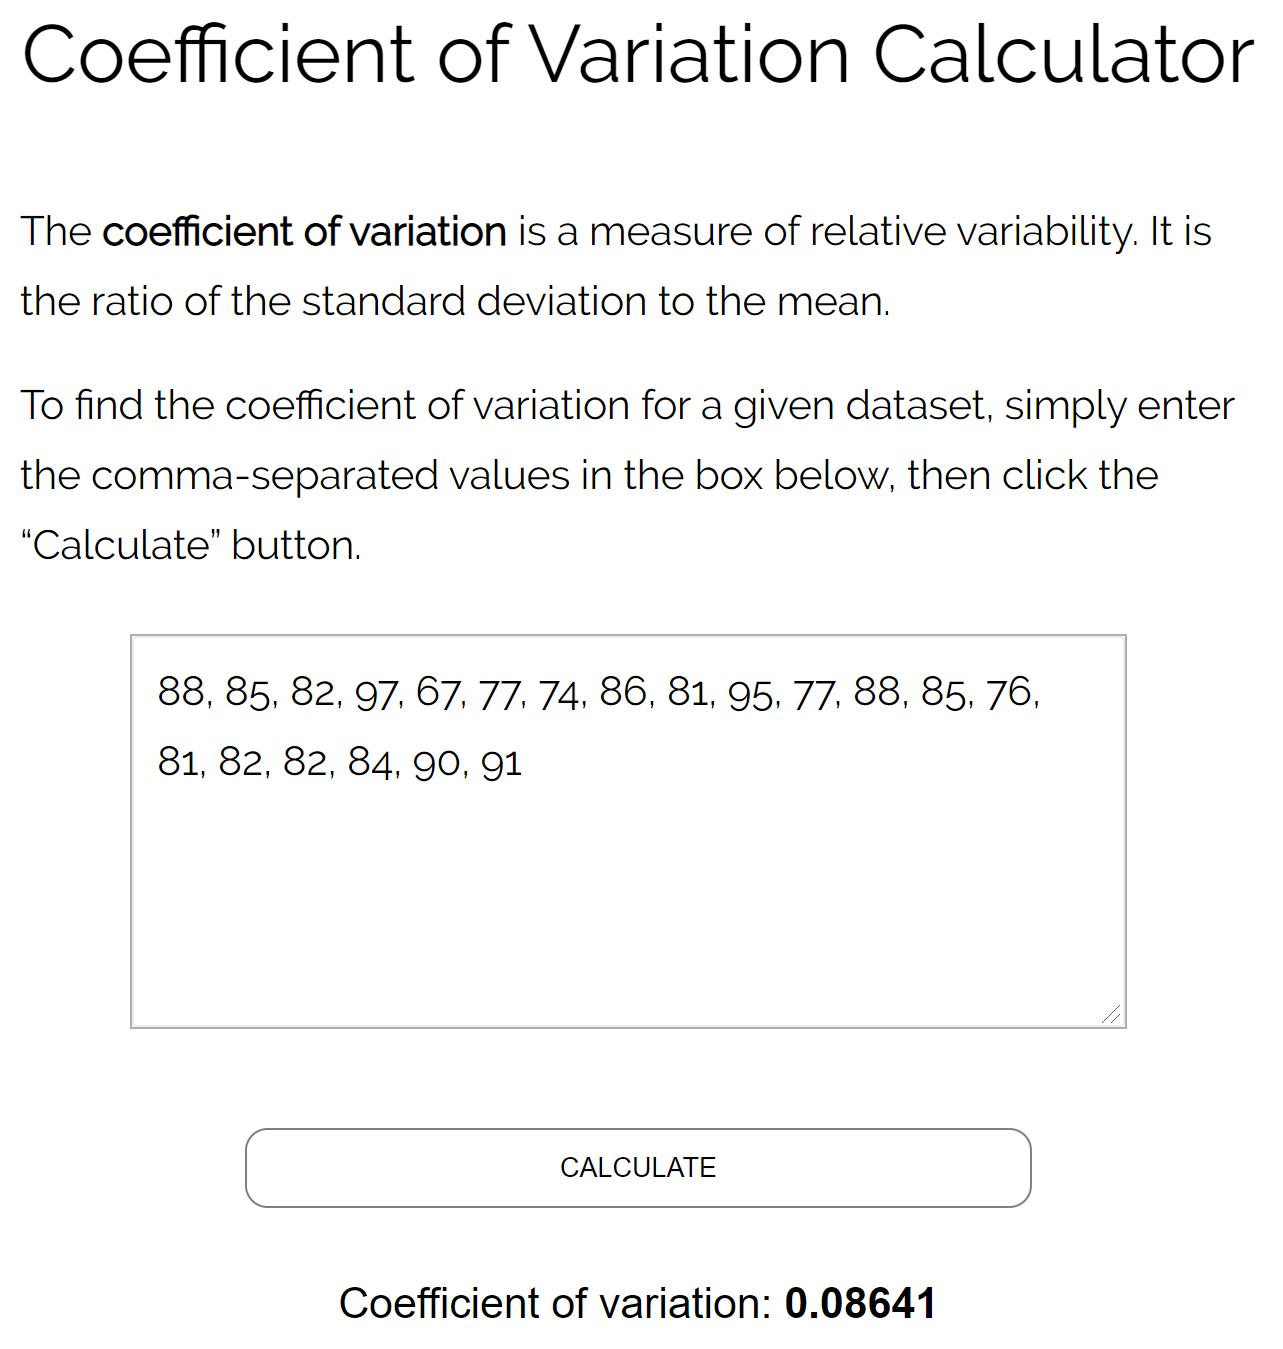 Coefficient of variation calculator example